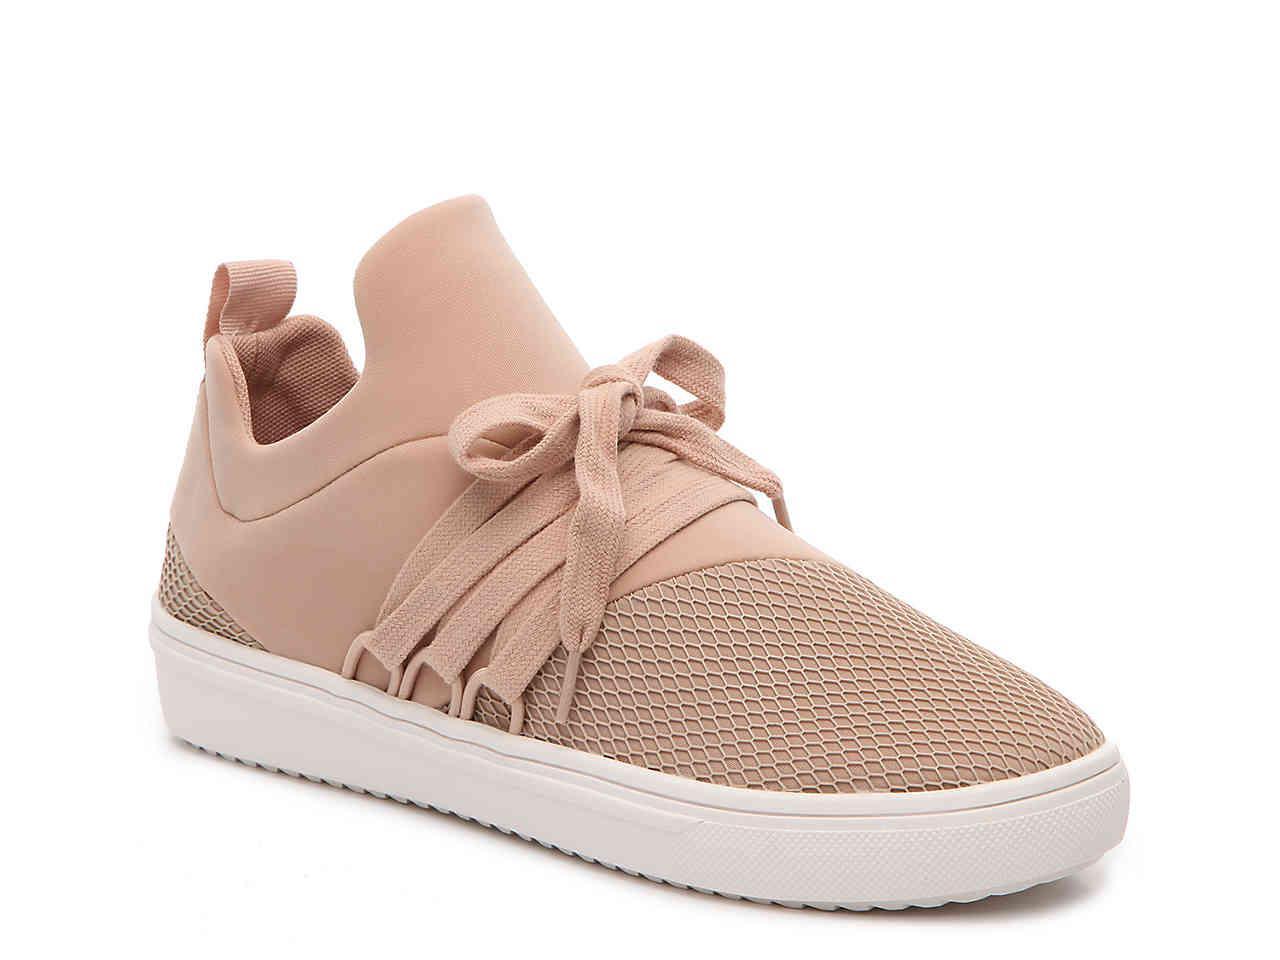 042d912eb5f076 Lyst - Steve Madden Lancer Sneaker in Pink